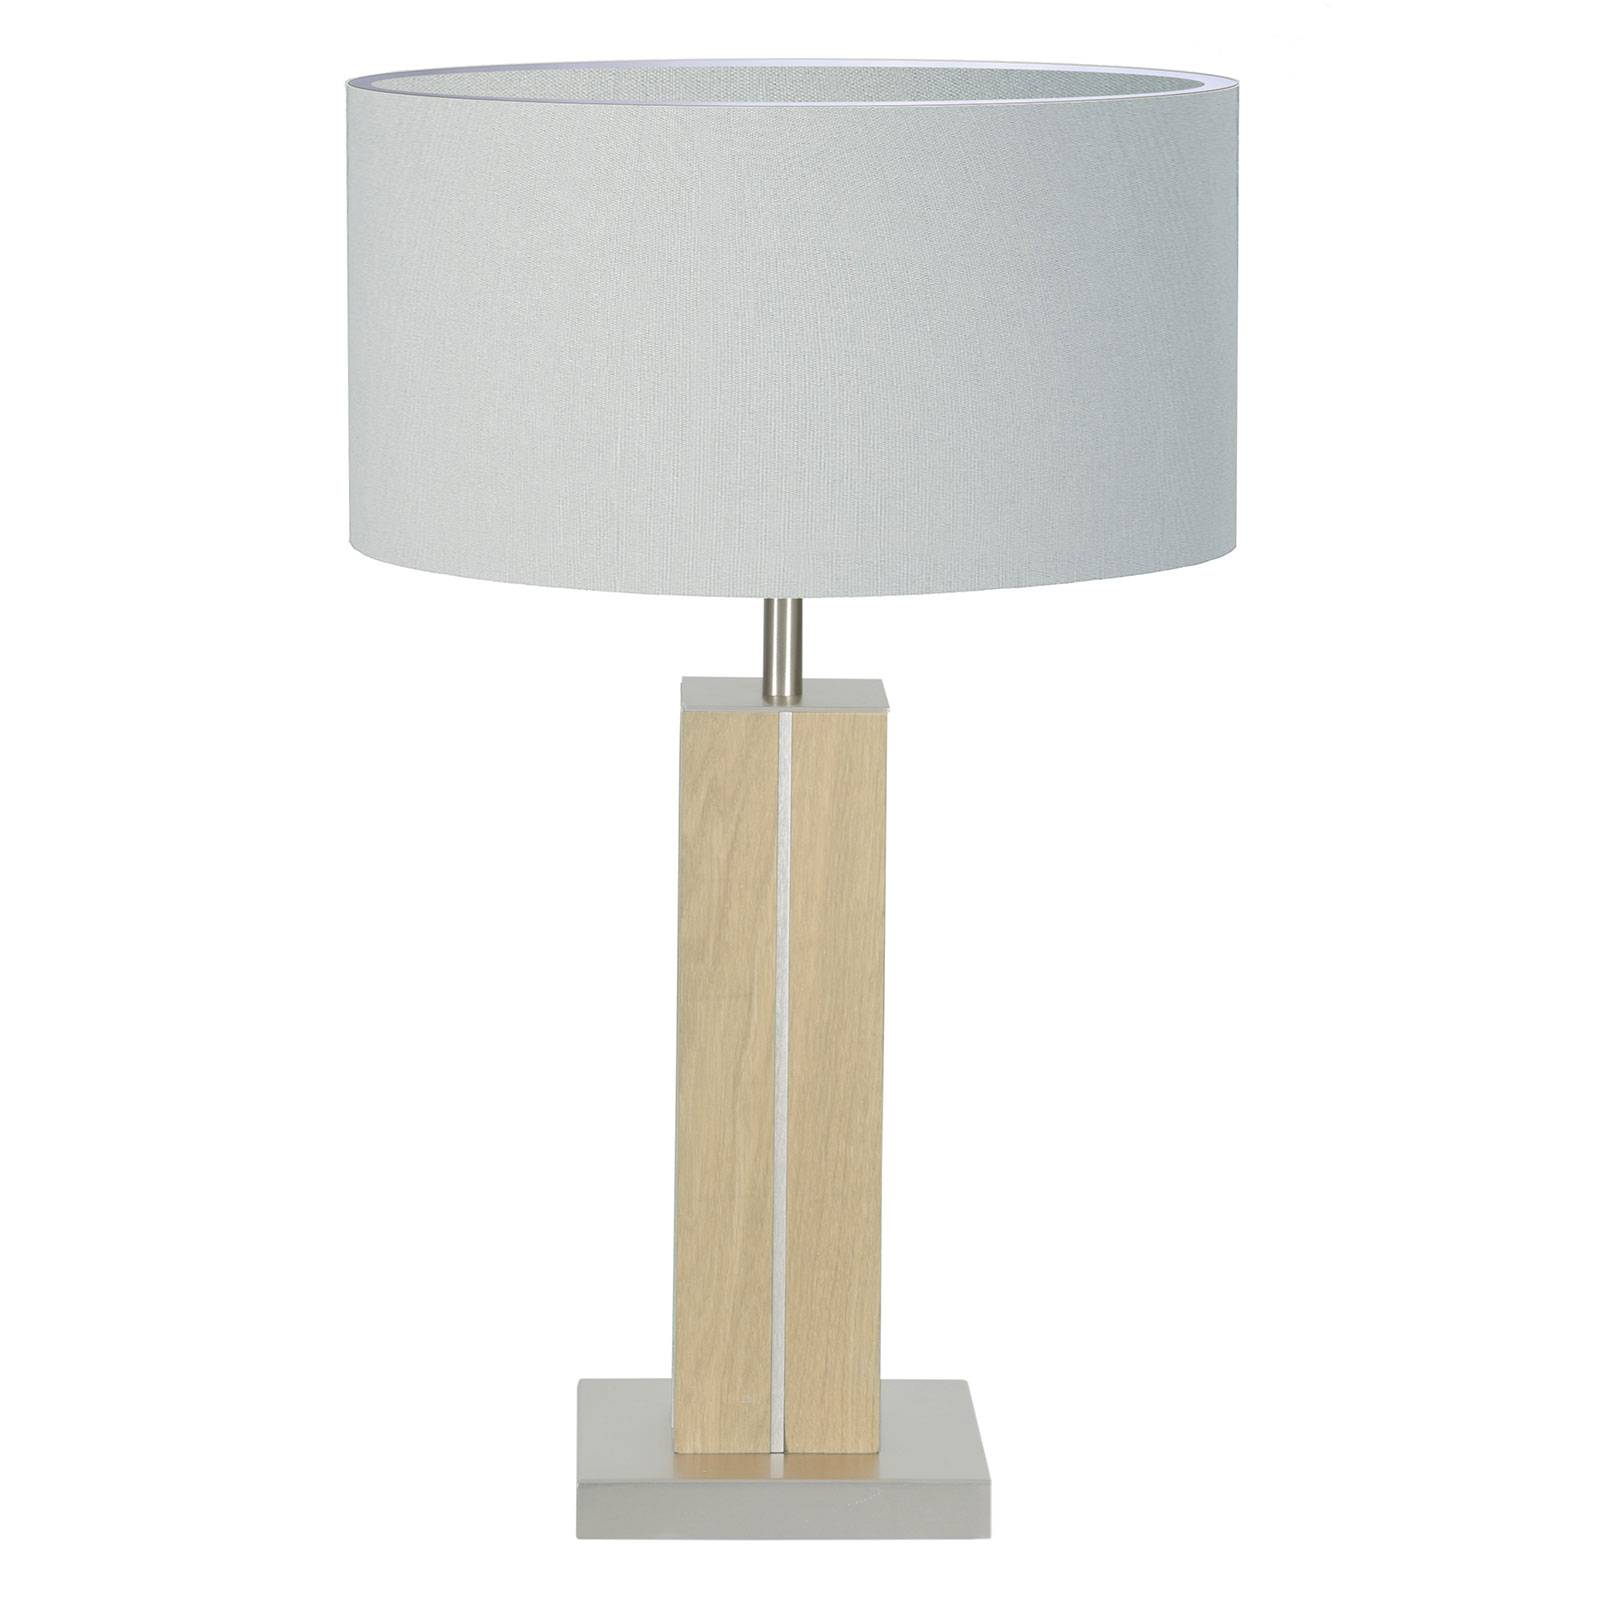 HerzBlut Dana tafellamp, eiken natuur, wit, 56cm